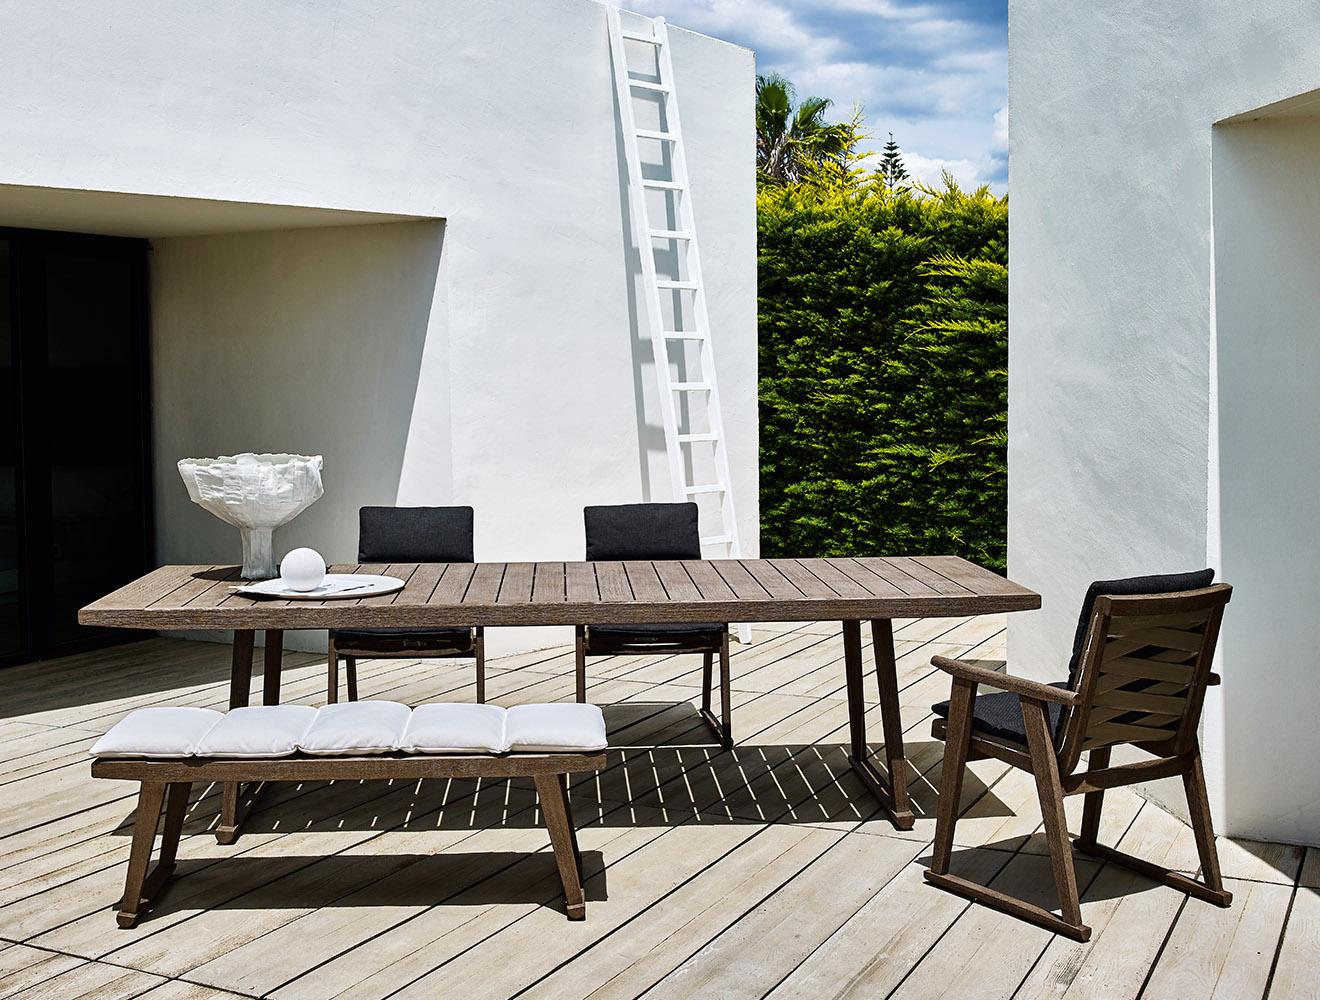 B b italia outdoor gio chair buy from campbell watson uk for B b italia outdoor